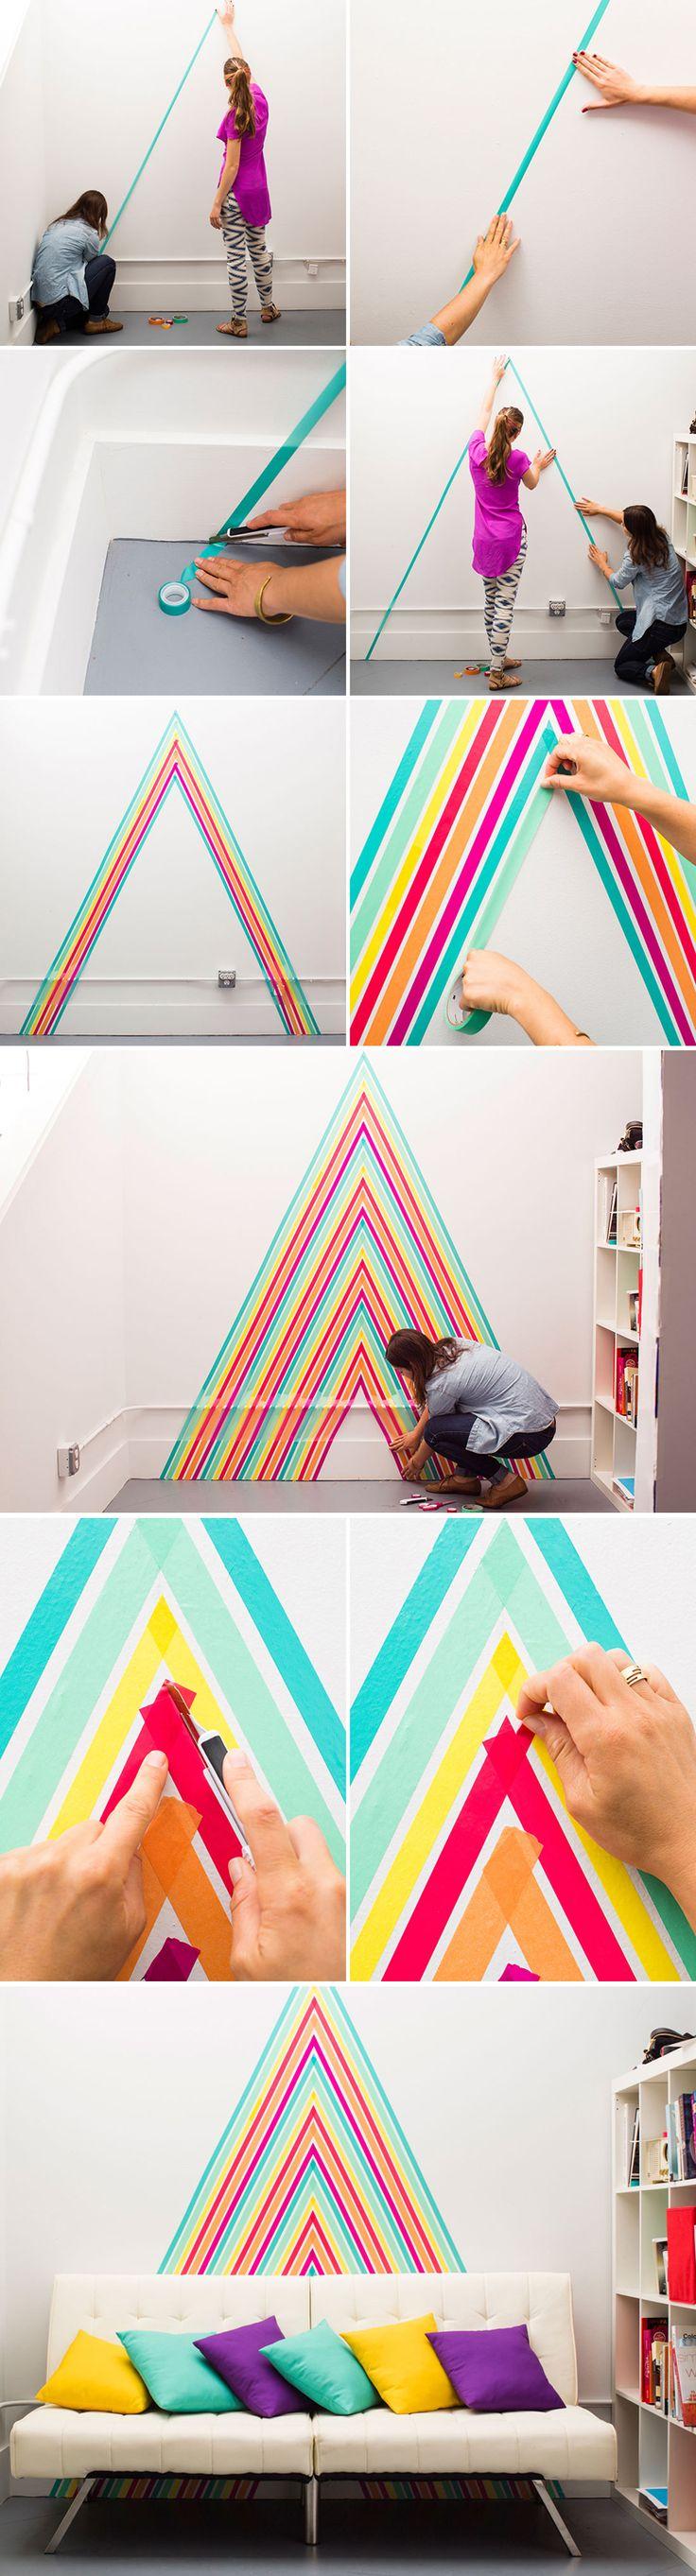 Easy, renter-friendly wall decor using washi tape.